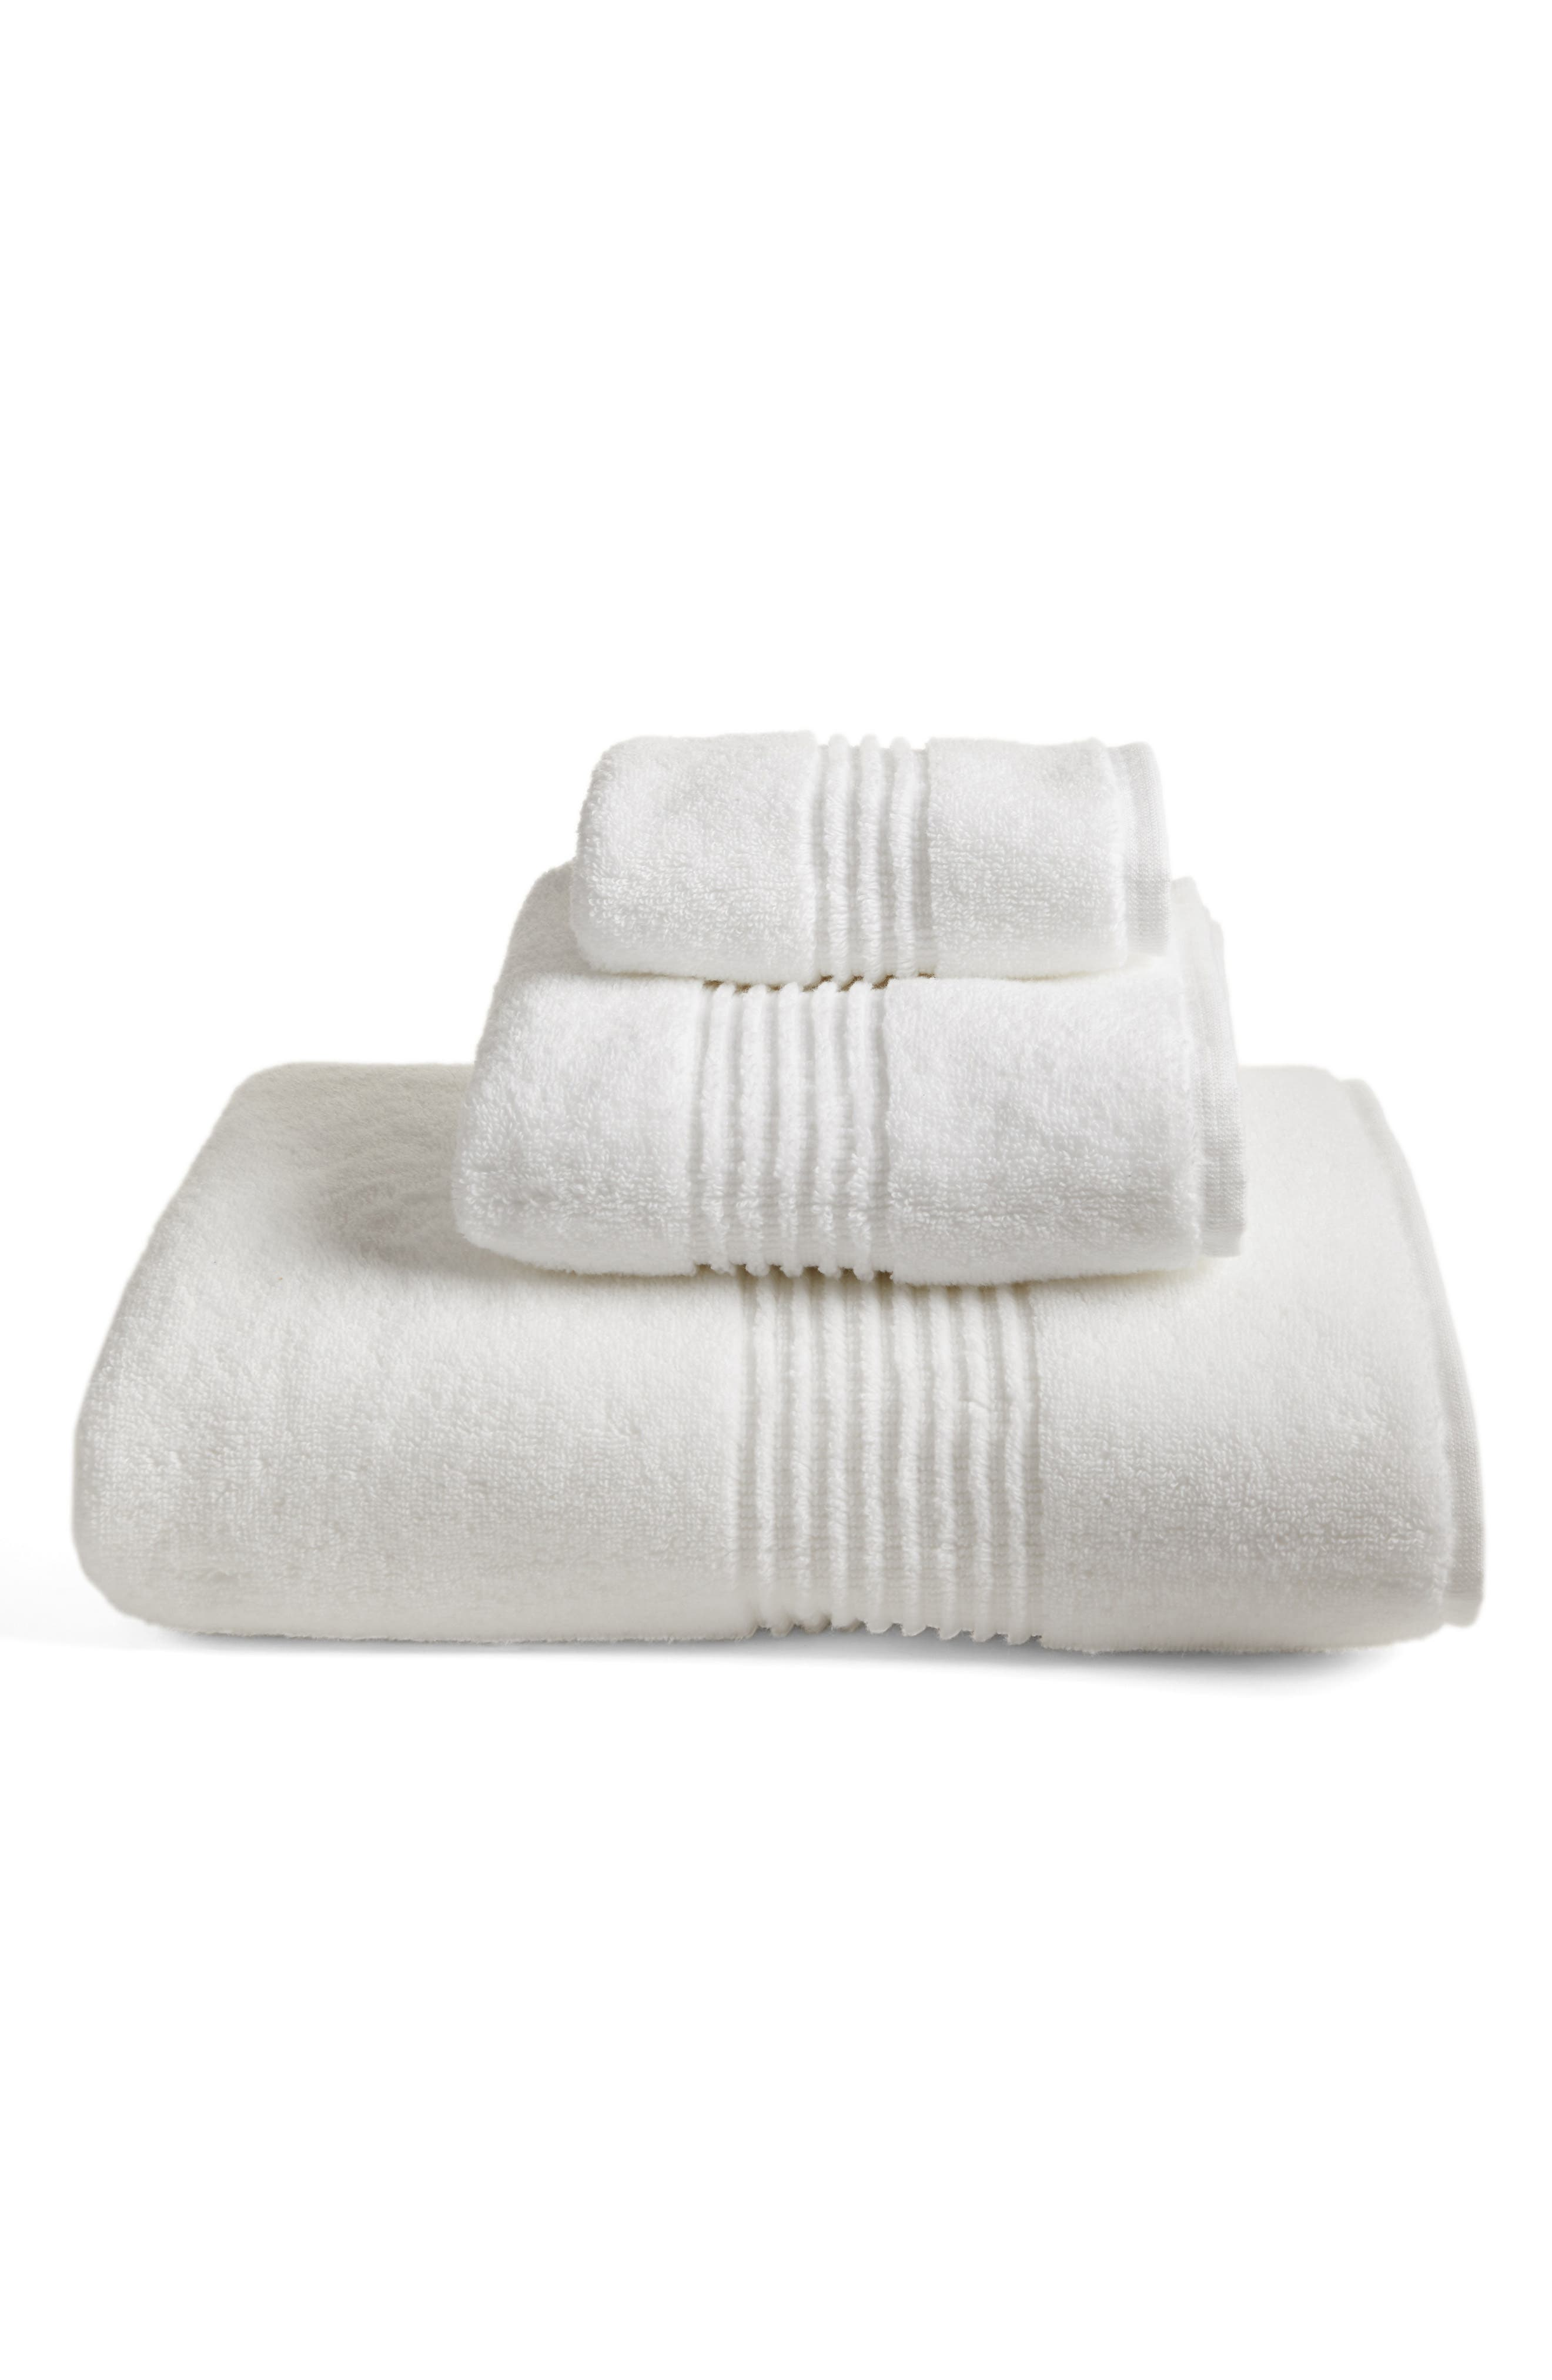 Organic Hydrocotton Heathered Bath Towel,                             Main thumbnail 1, color,                             100